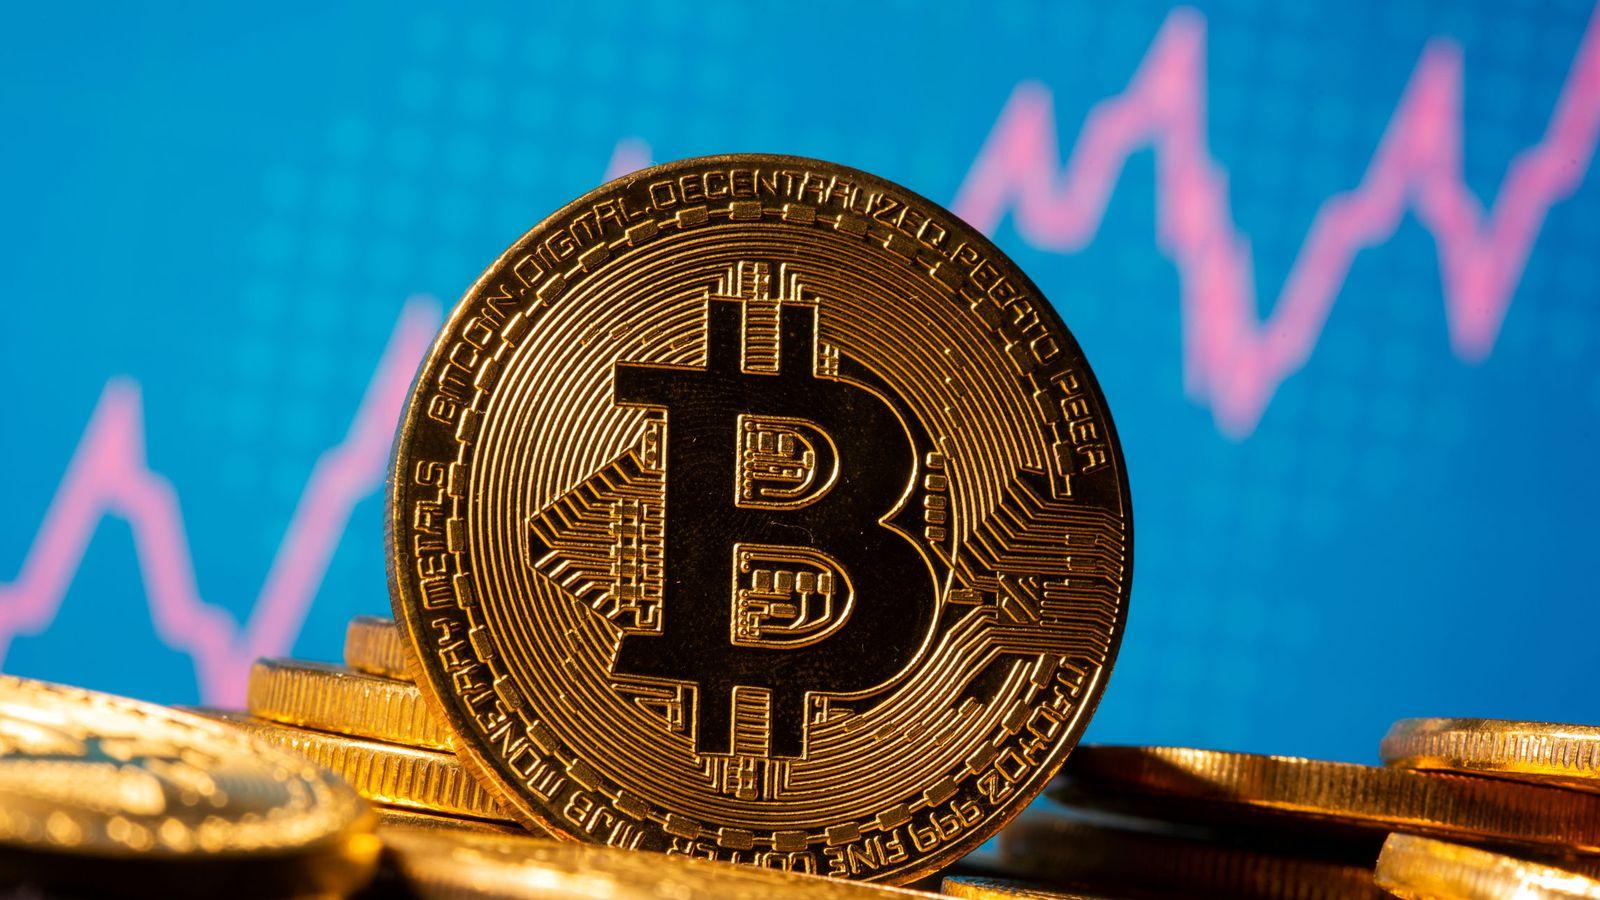 ¿cuánto dinero puedo ganar españando un criptobot? mejor broker de bitcoin para españar